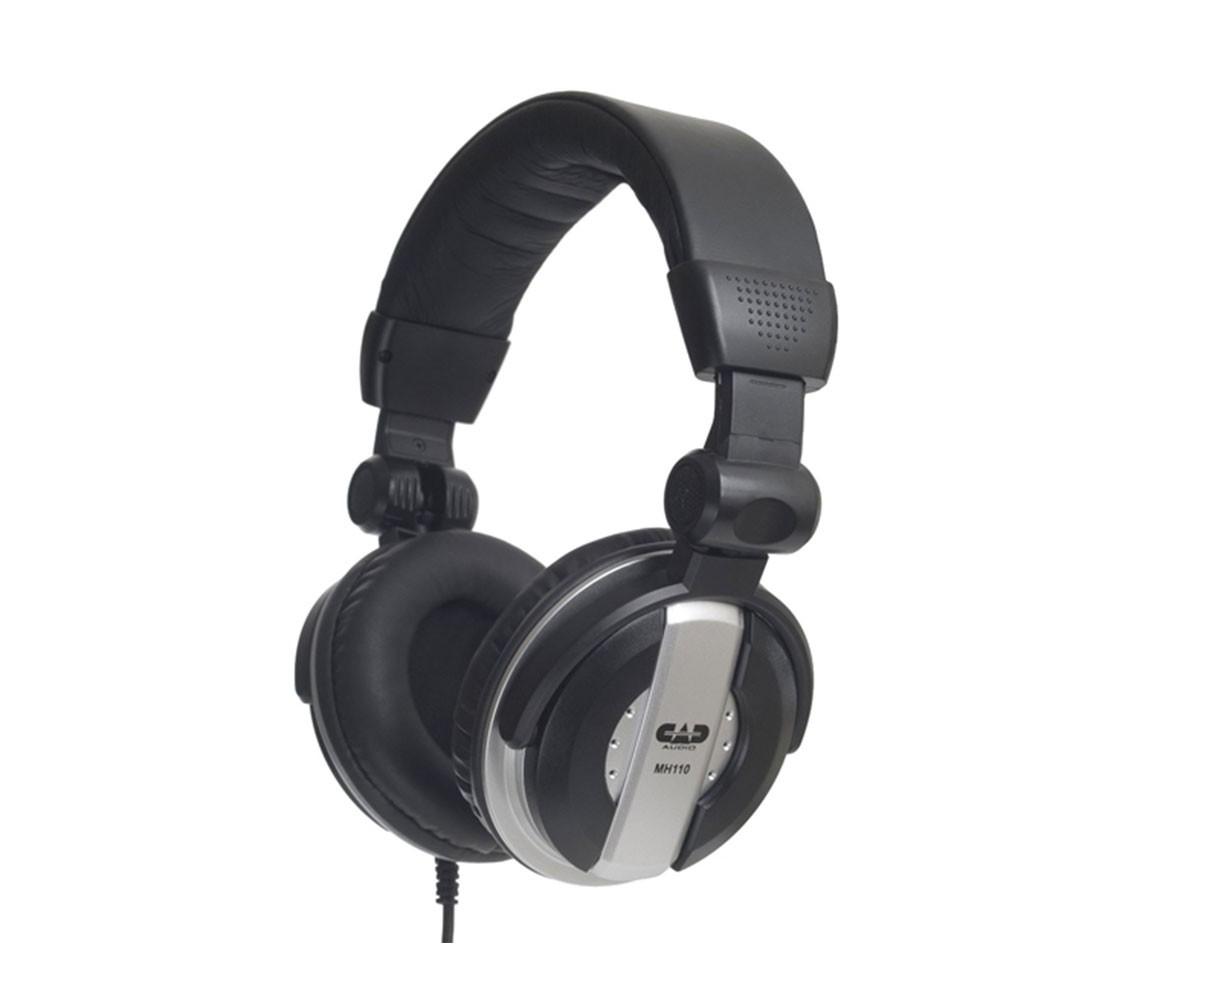 CAD MH110 Closed-back Studio Headphones - 50mm Drivers - Easy-fold Comfort Fit